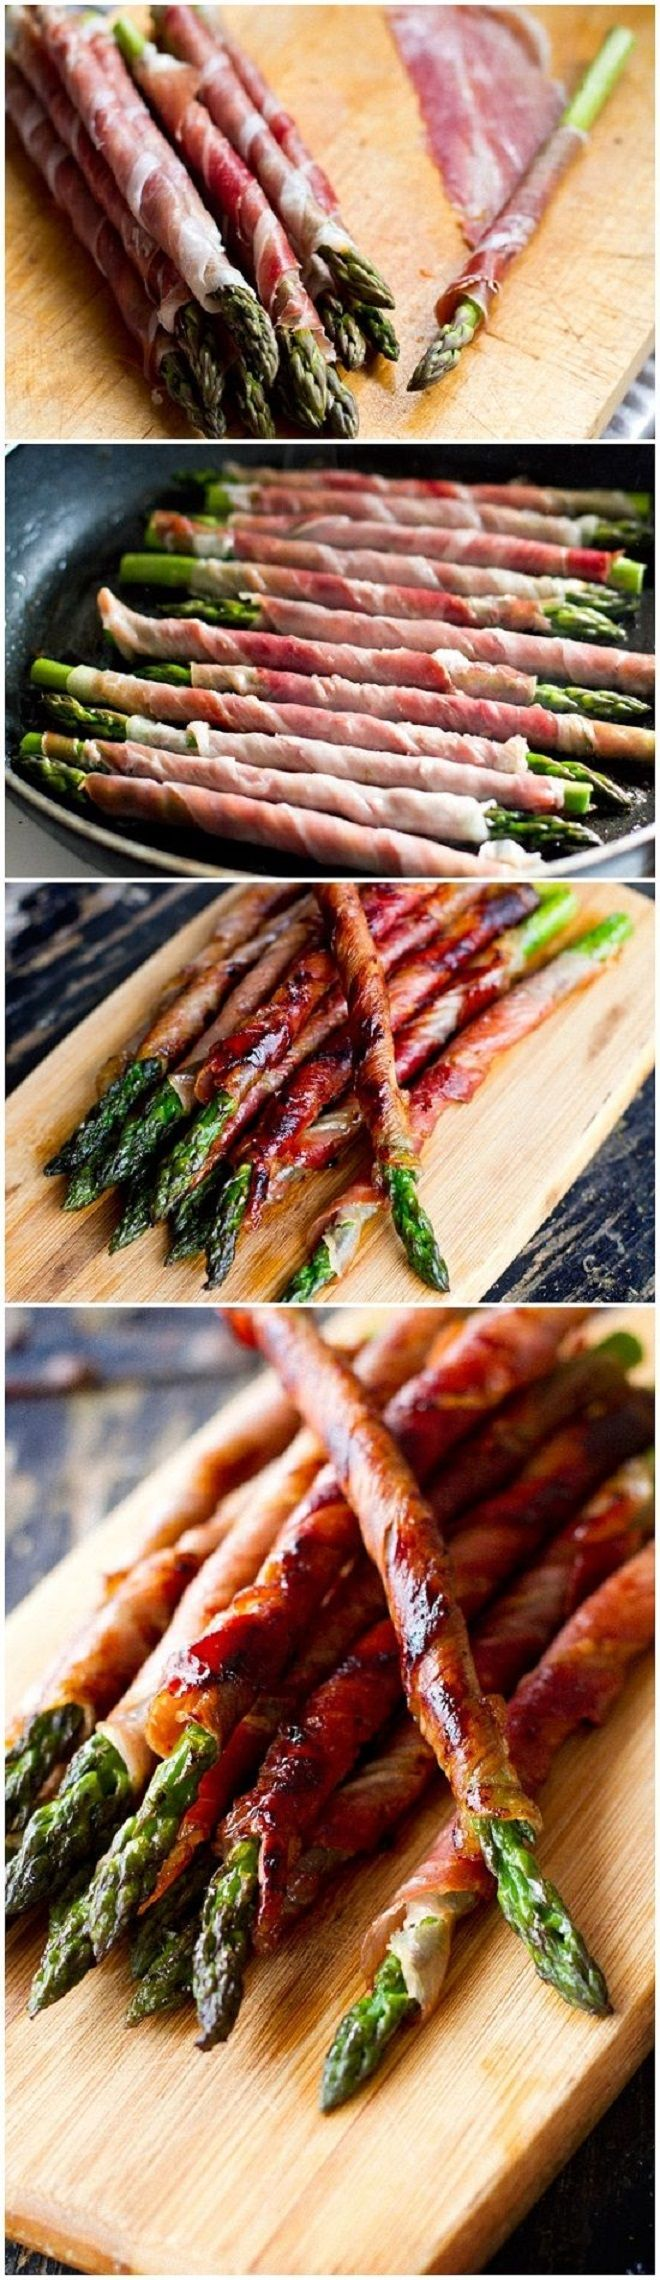 Prosciutto Wrapped Asparagus.. Crispier than bacon. Cut asparagus into thirds to make a canapé version. More